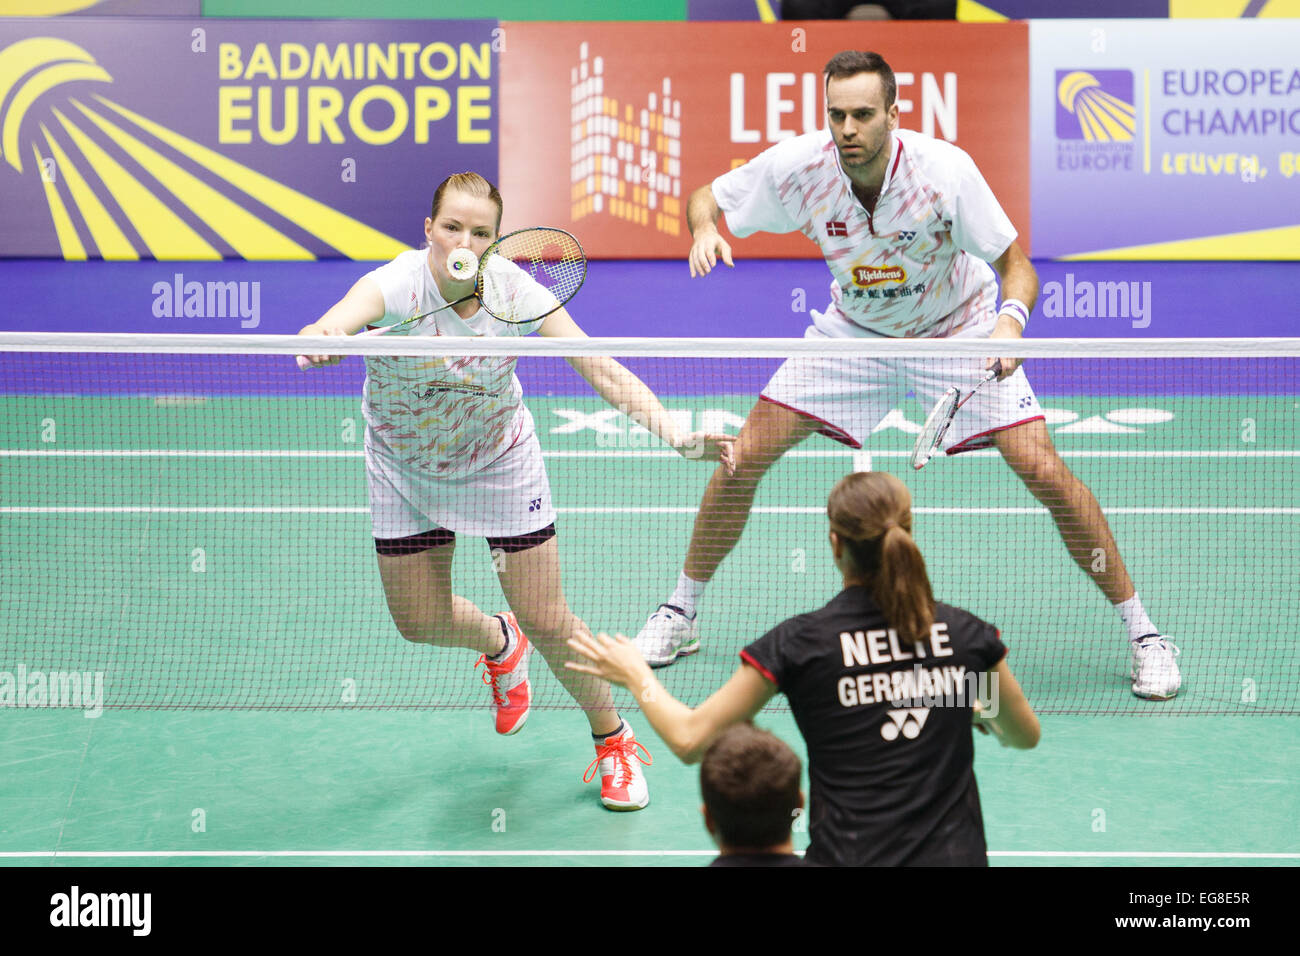 LEUVEN BELGIUM 14 02 2015 Badminton players Christinna Pedersen